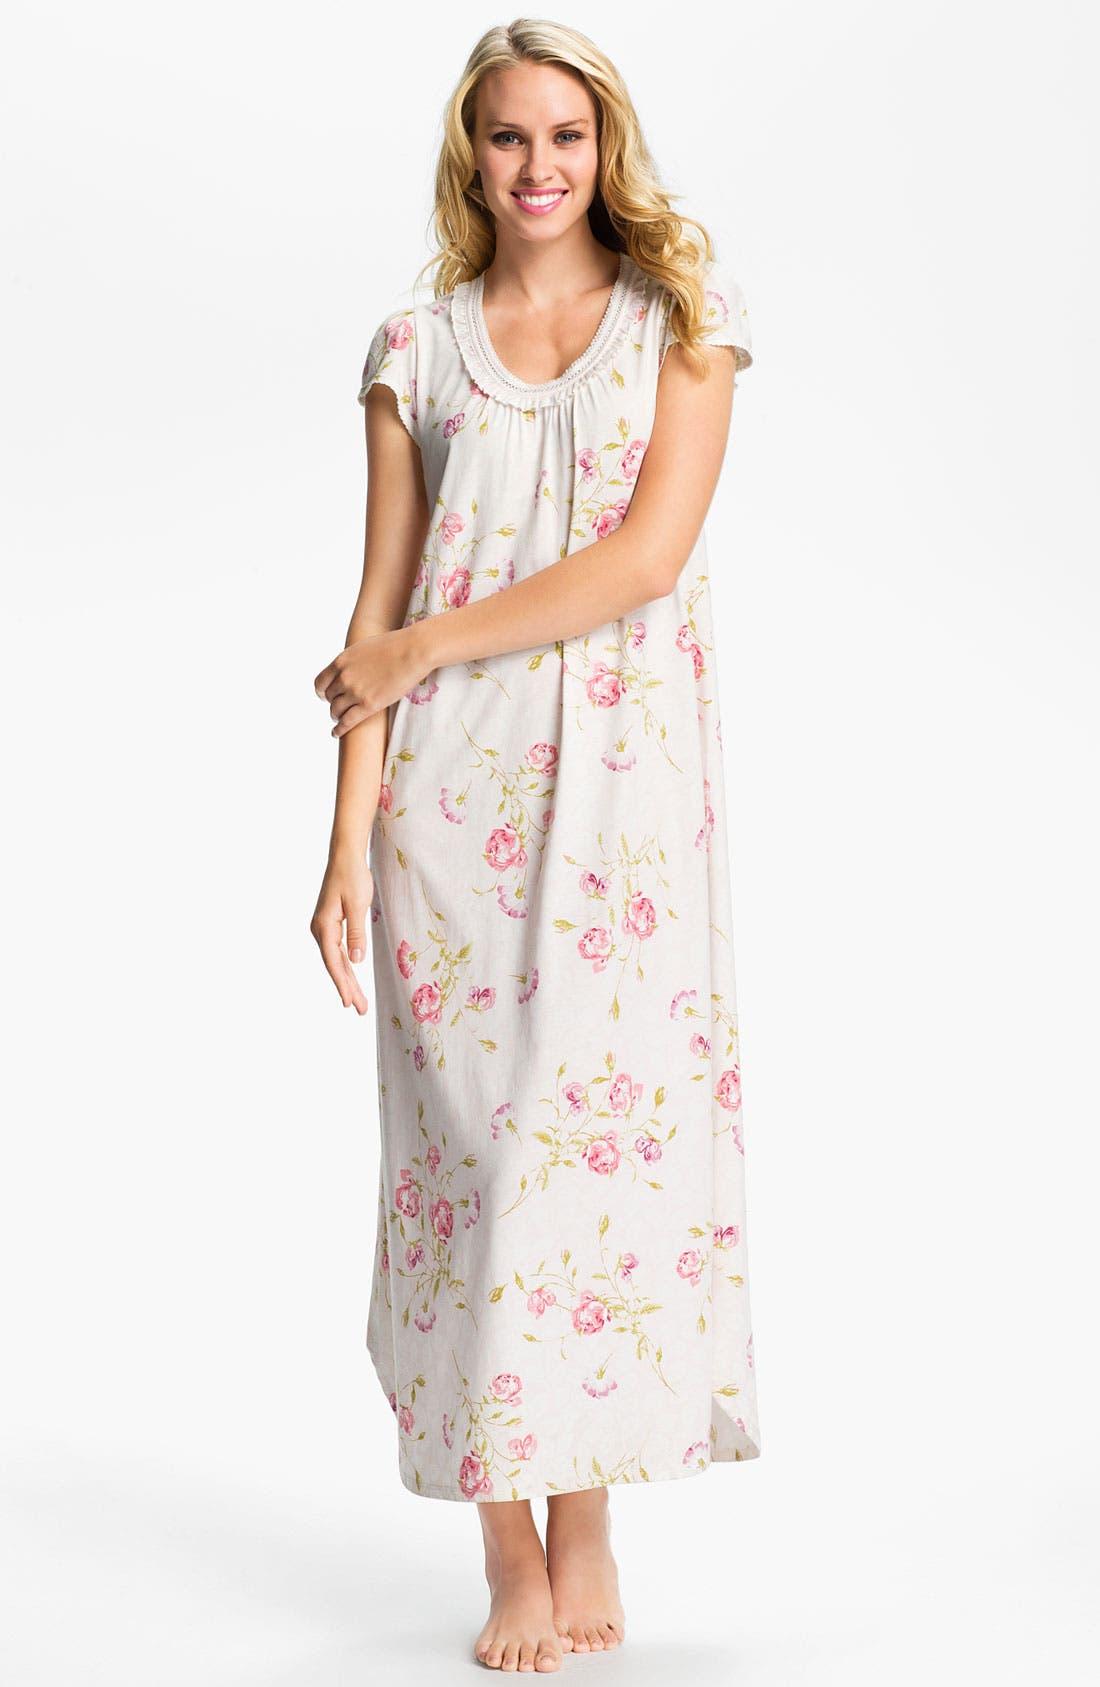 Main Image - Carole Hochman Designs 'Vintage Roses' Nightgown